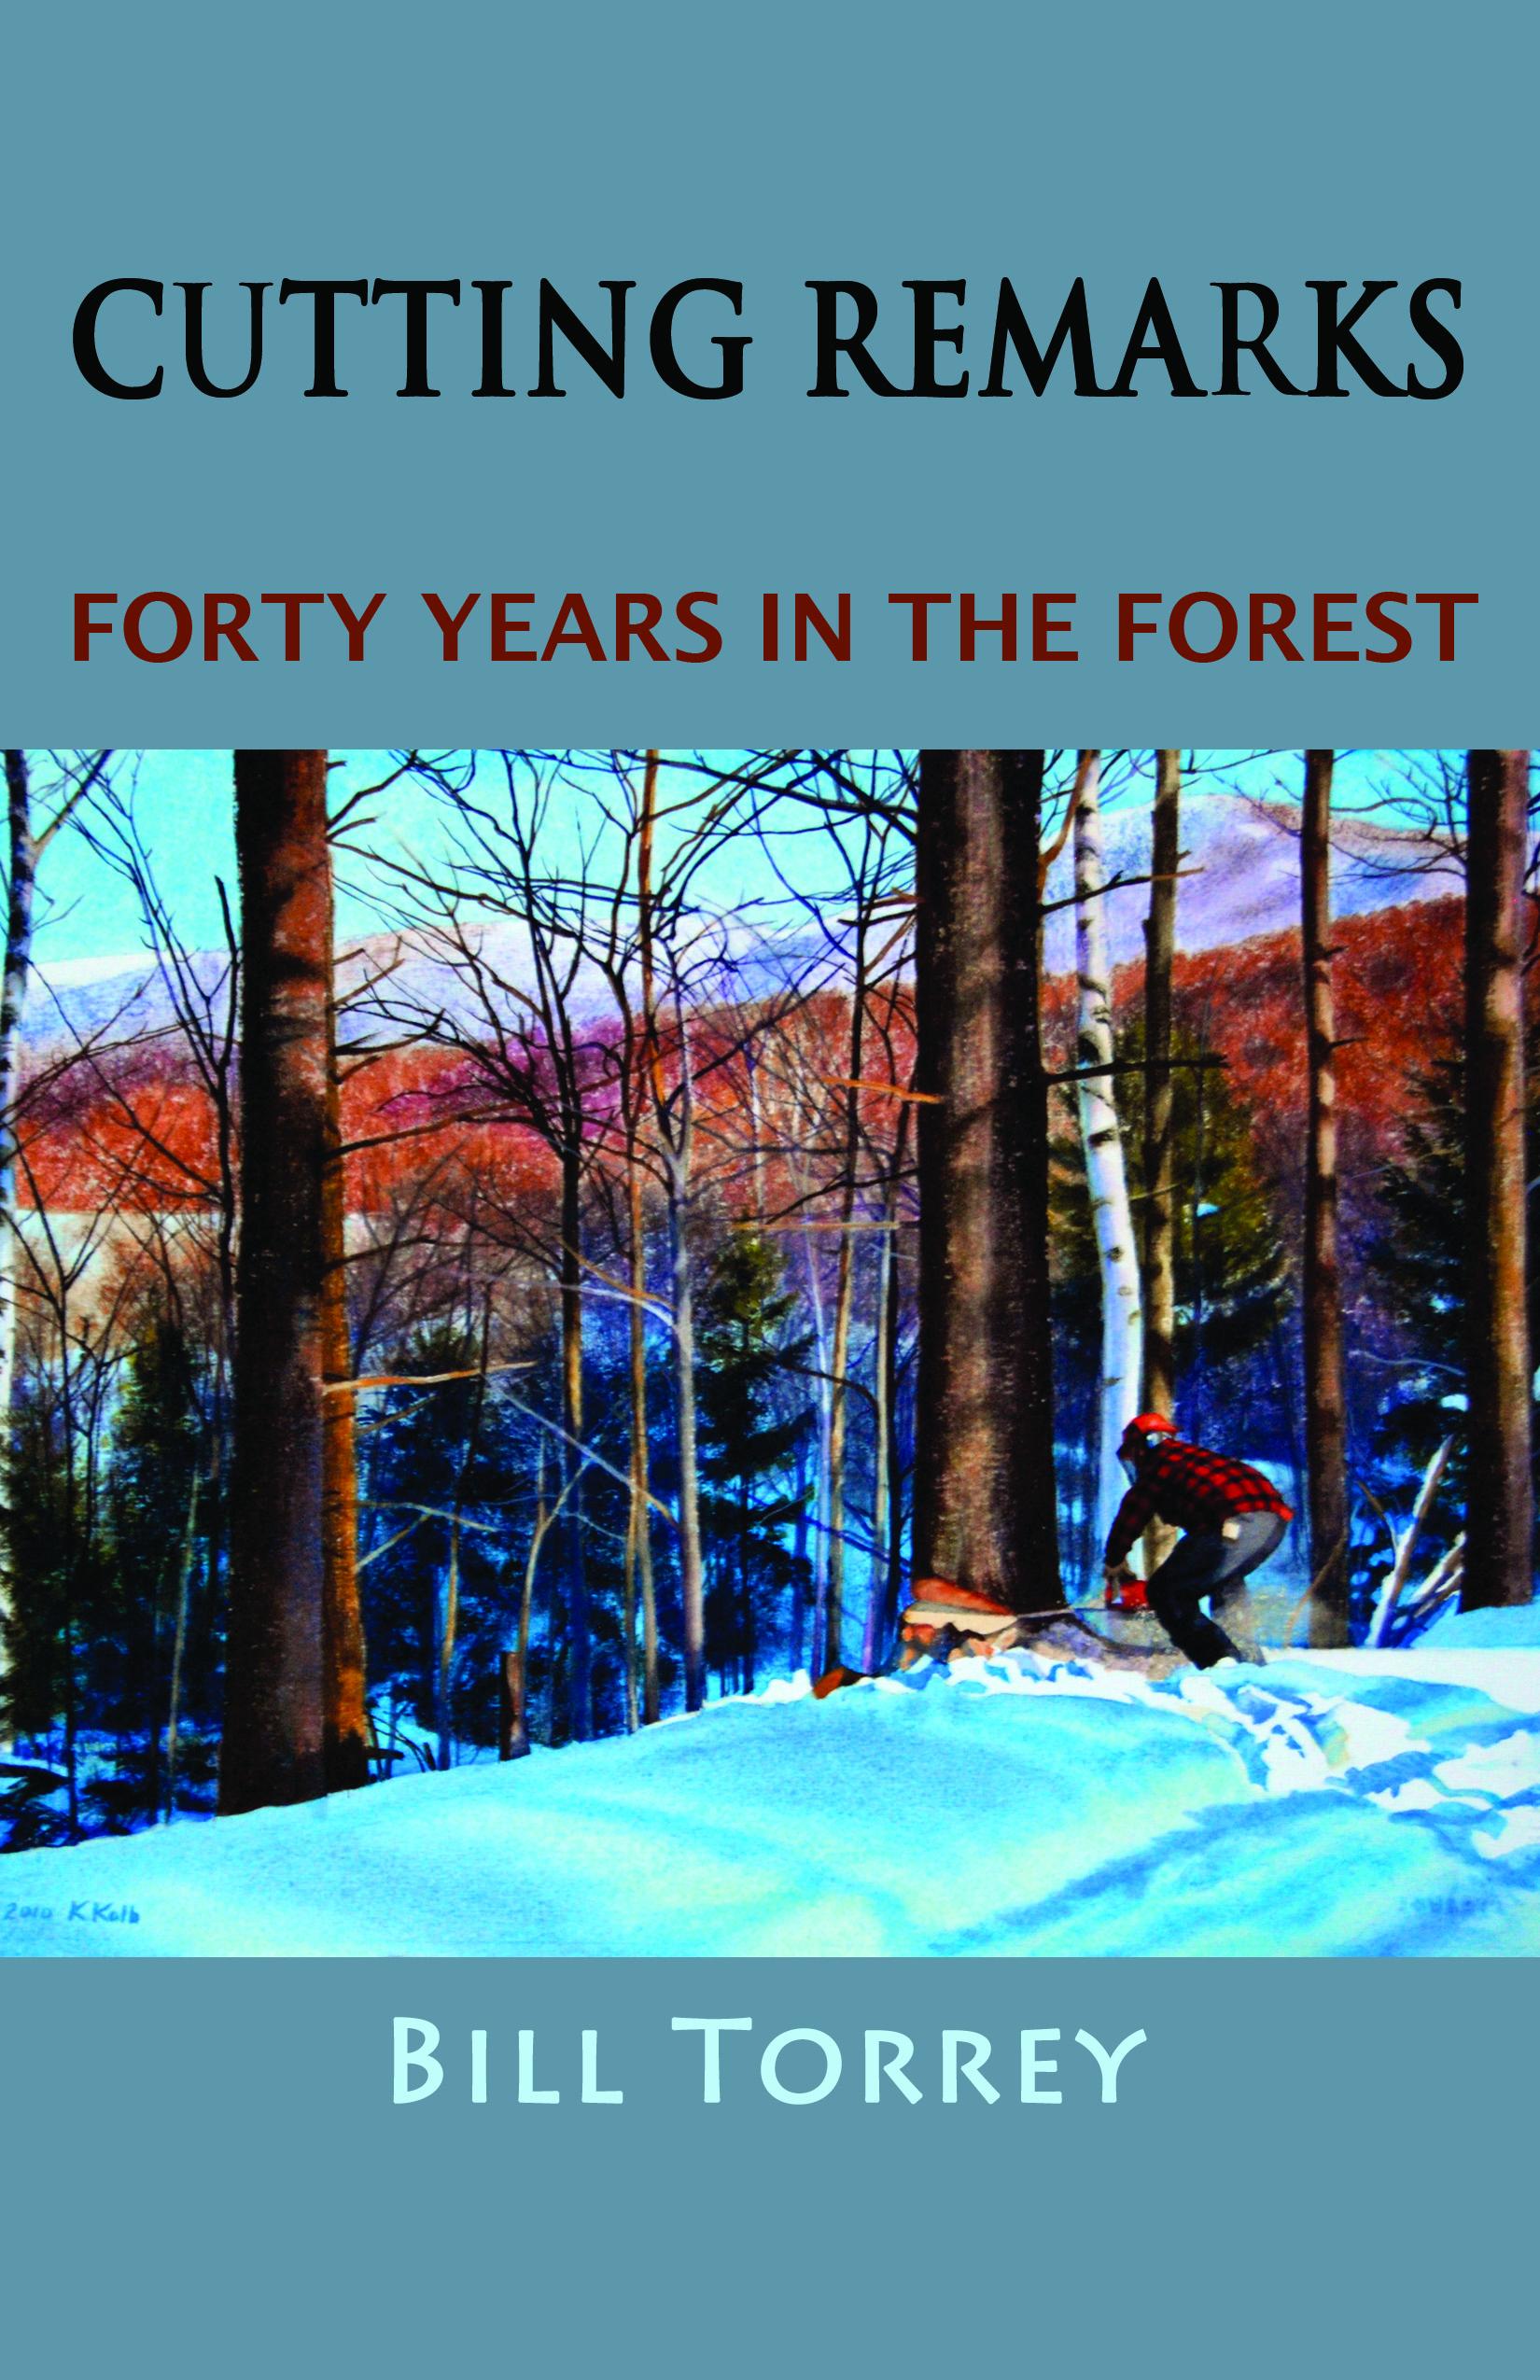 Kathleen Kolb painting of Bill Torrey workin in the woods